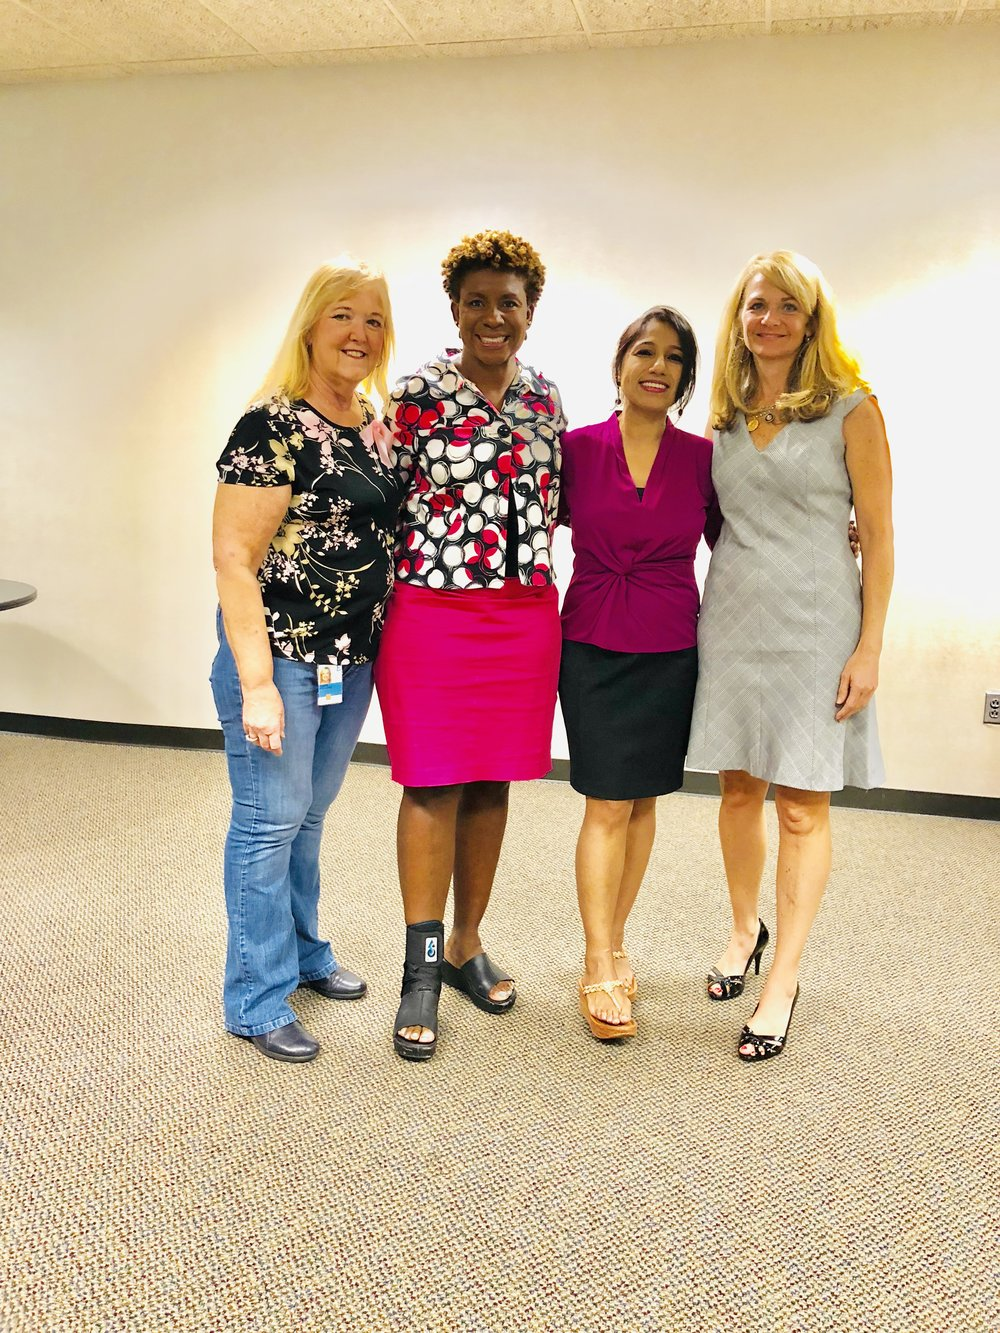 L to R: Tanya, Cathy, Me(Lopa), Maura